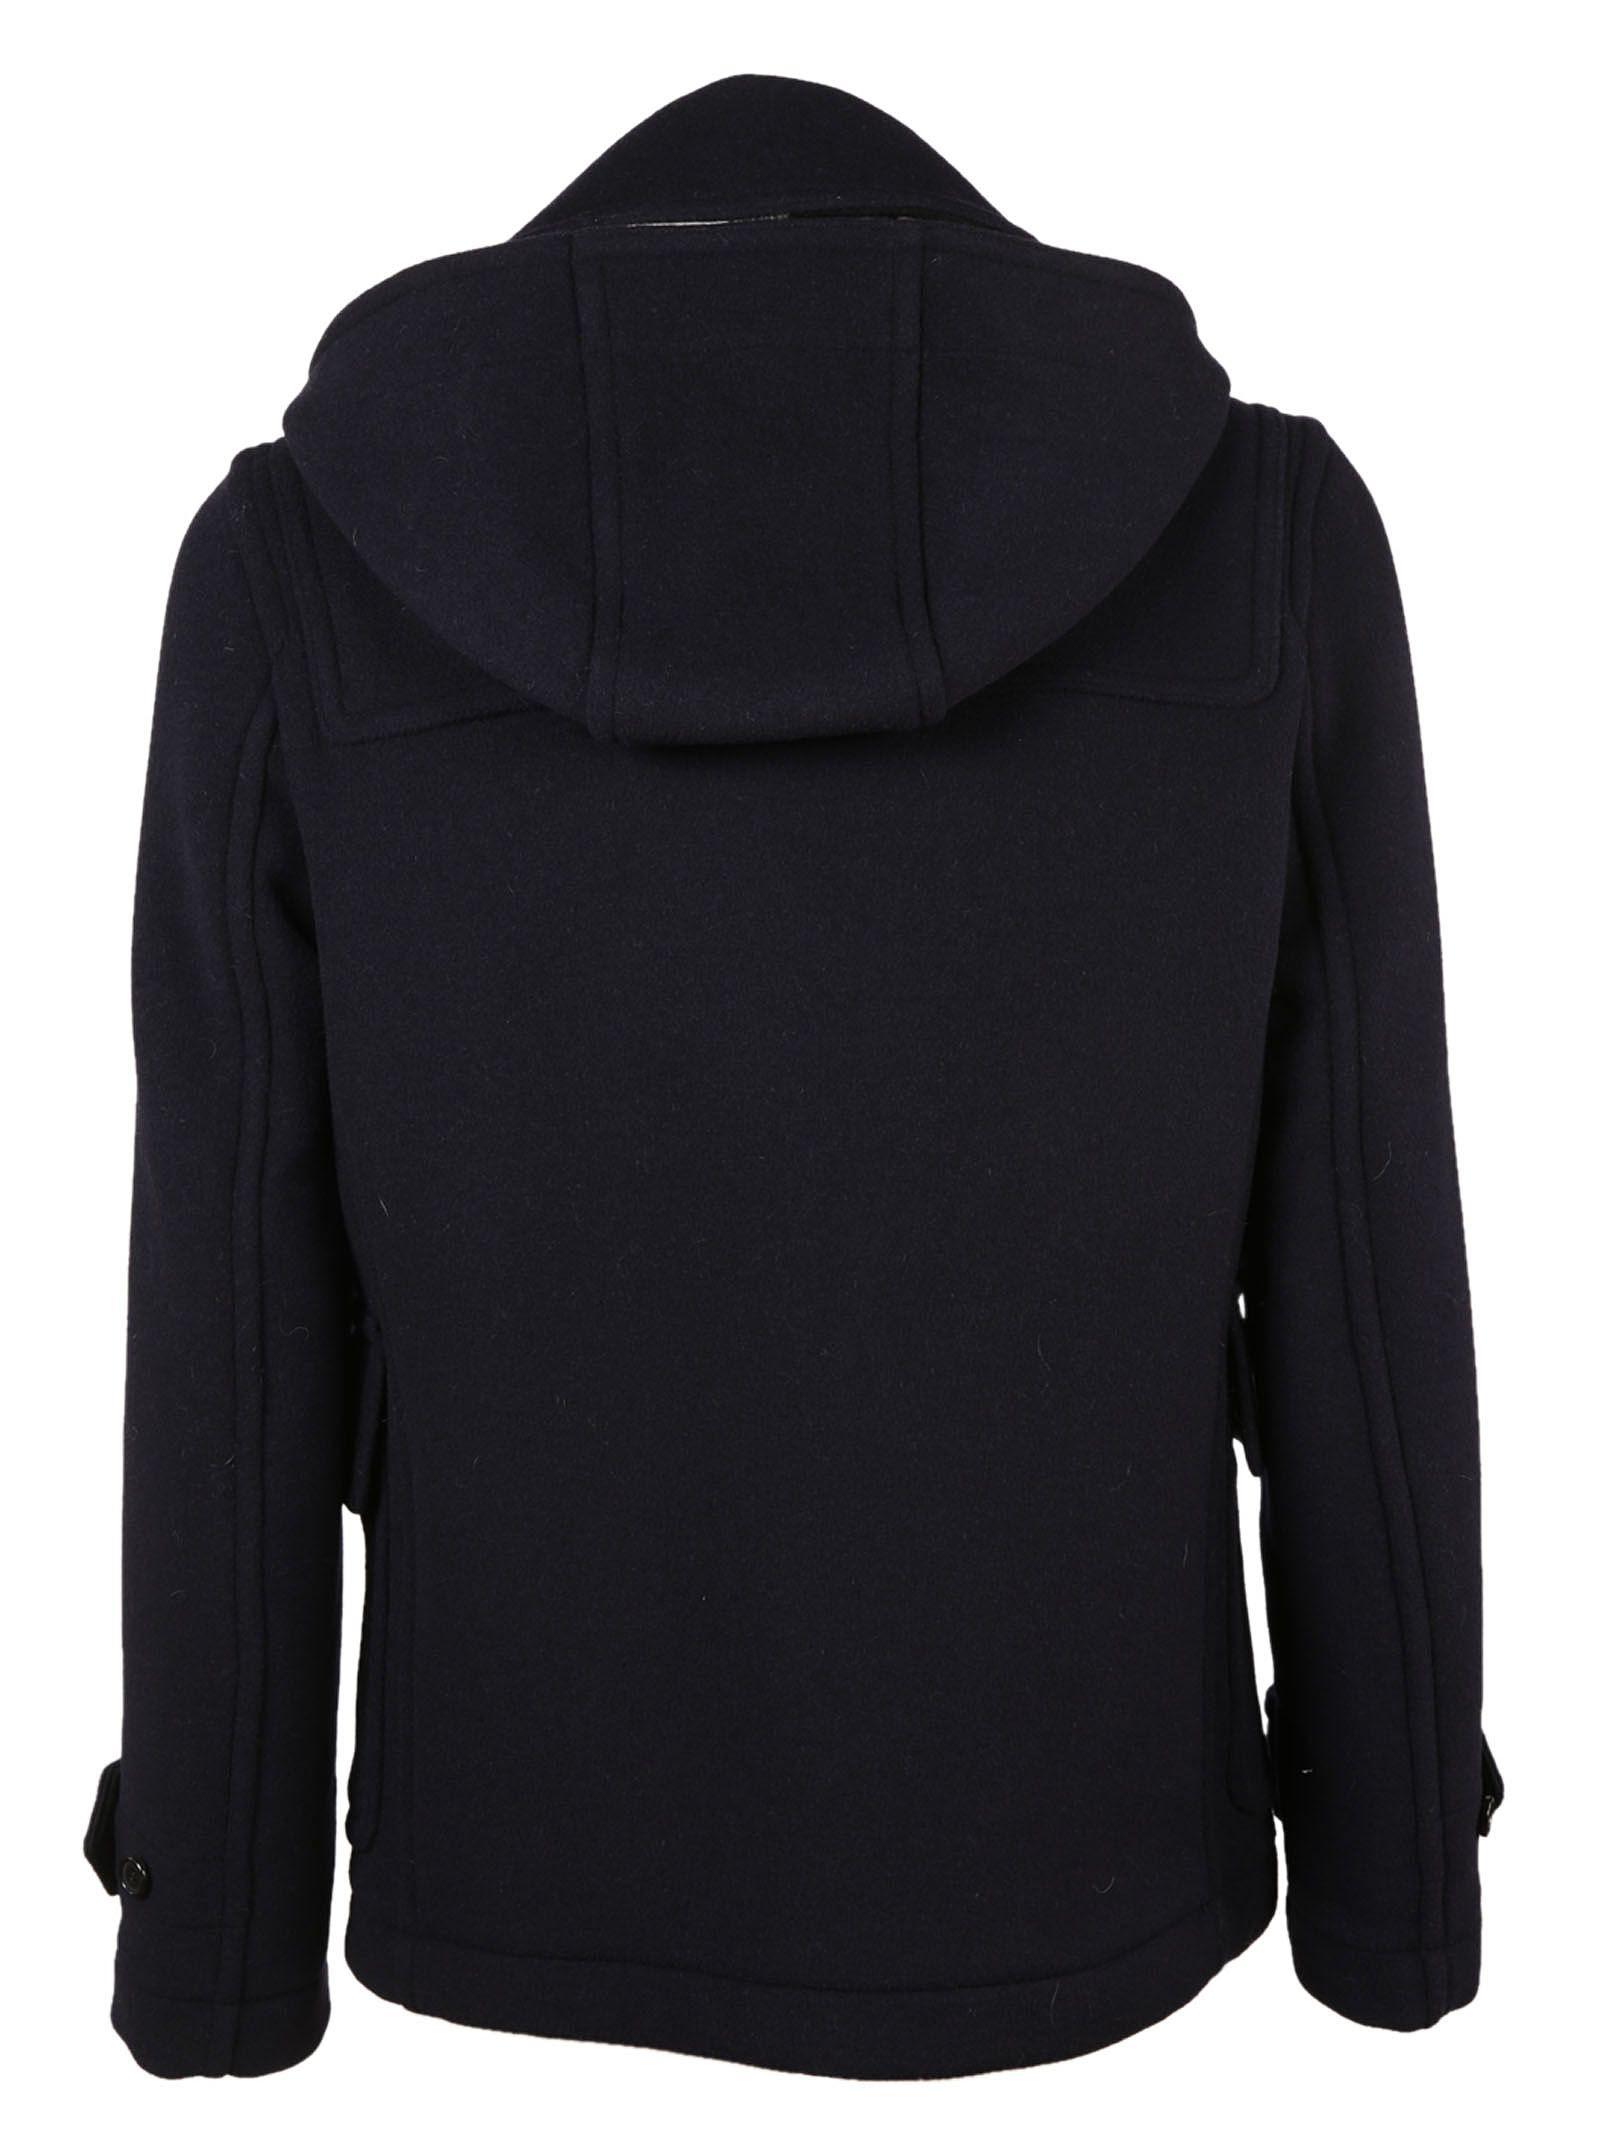 burberry hoodie mens white